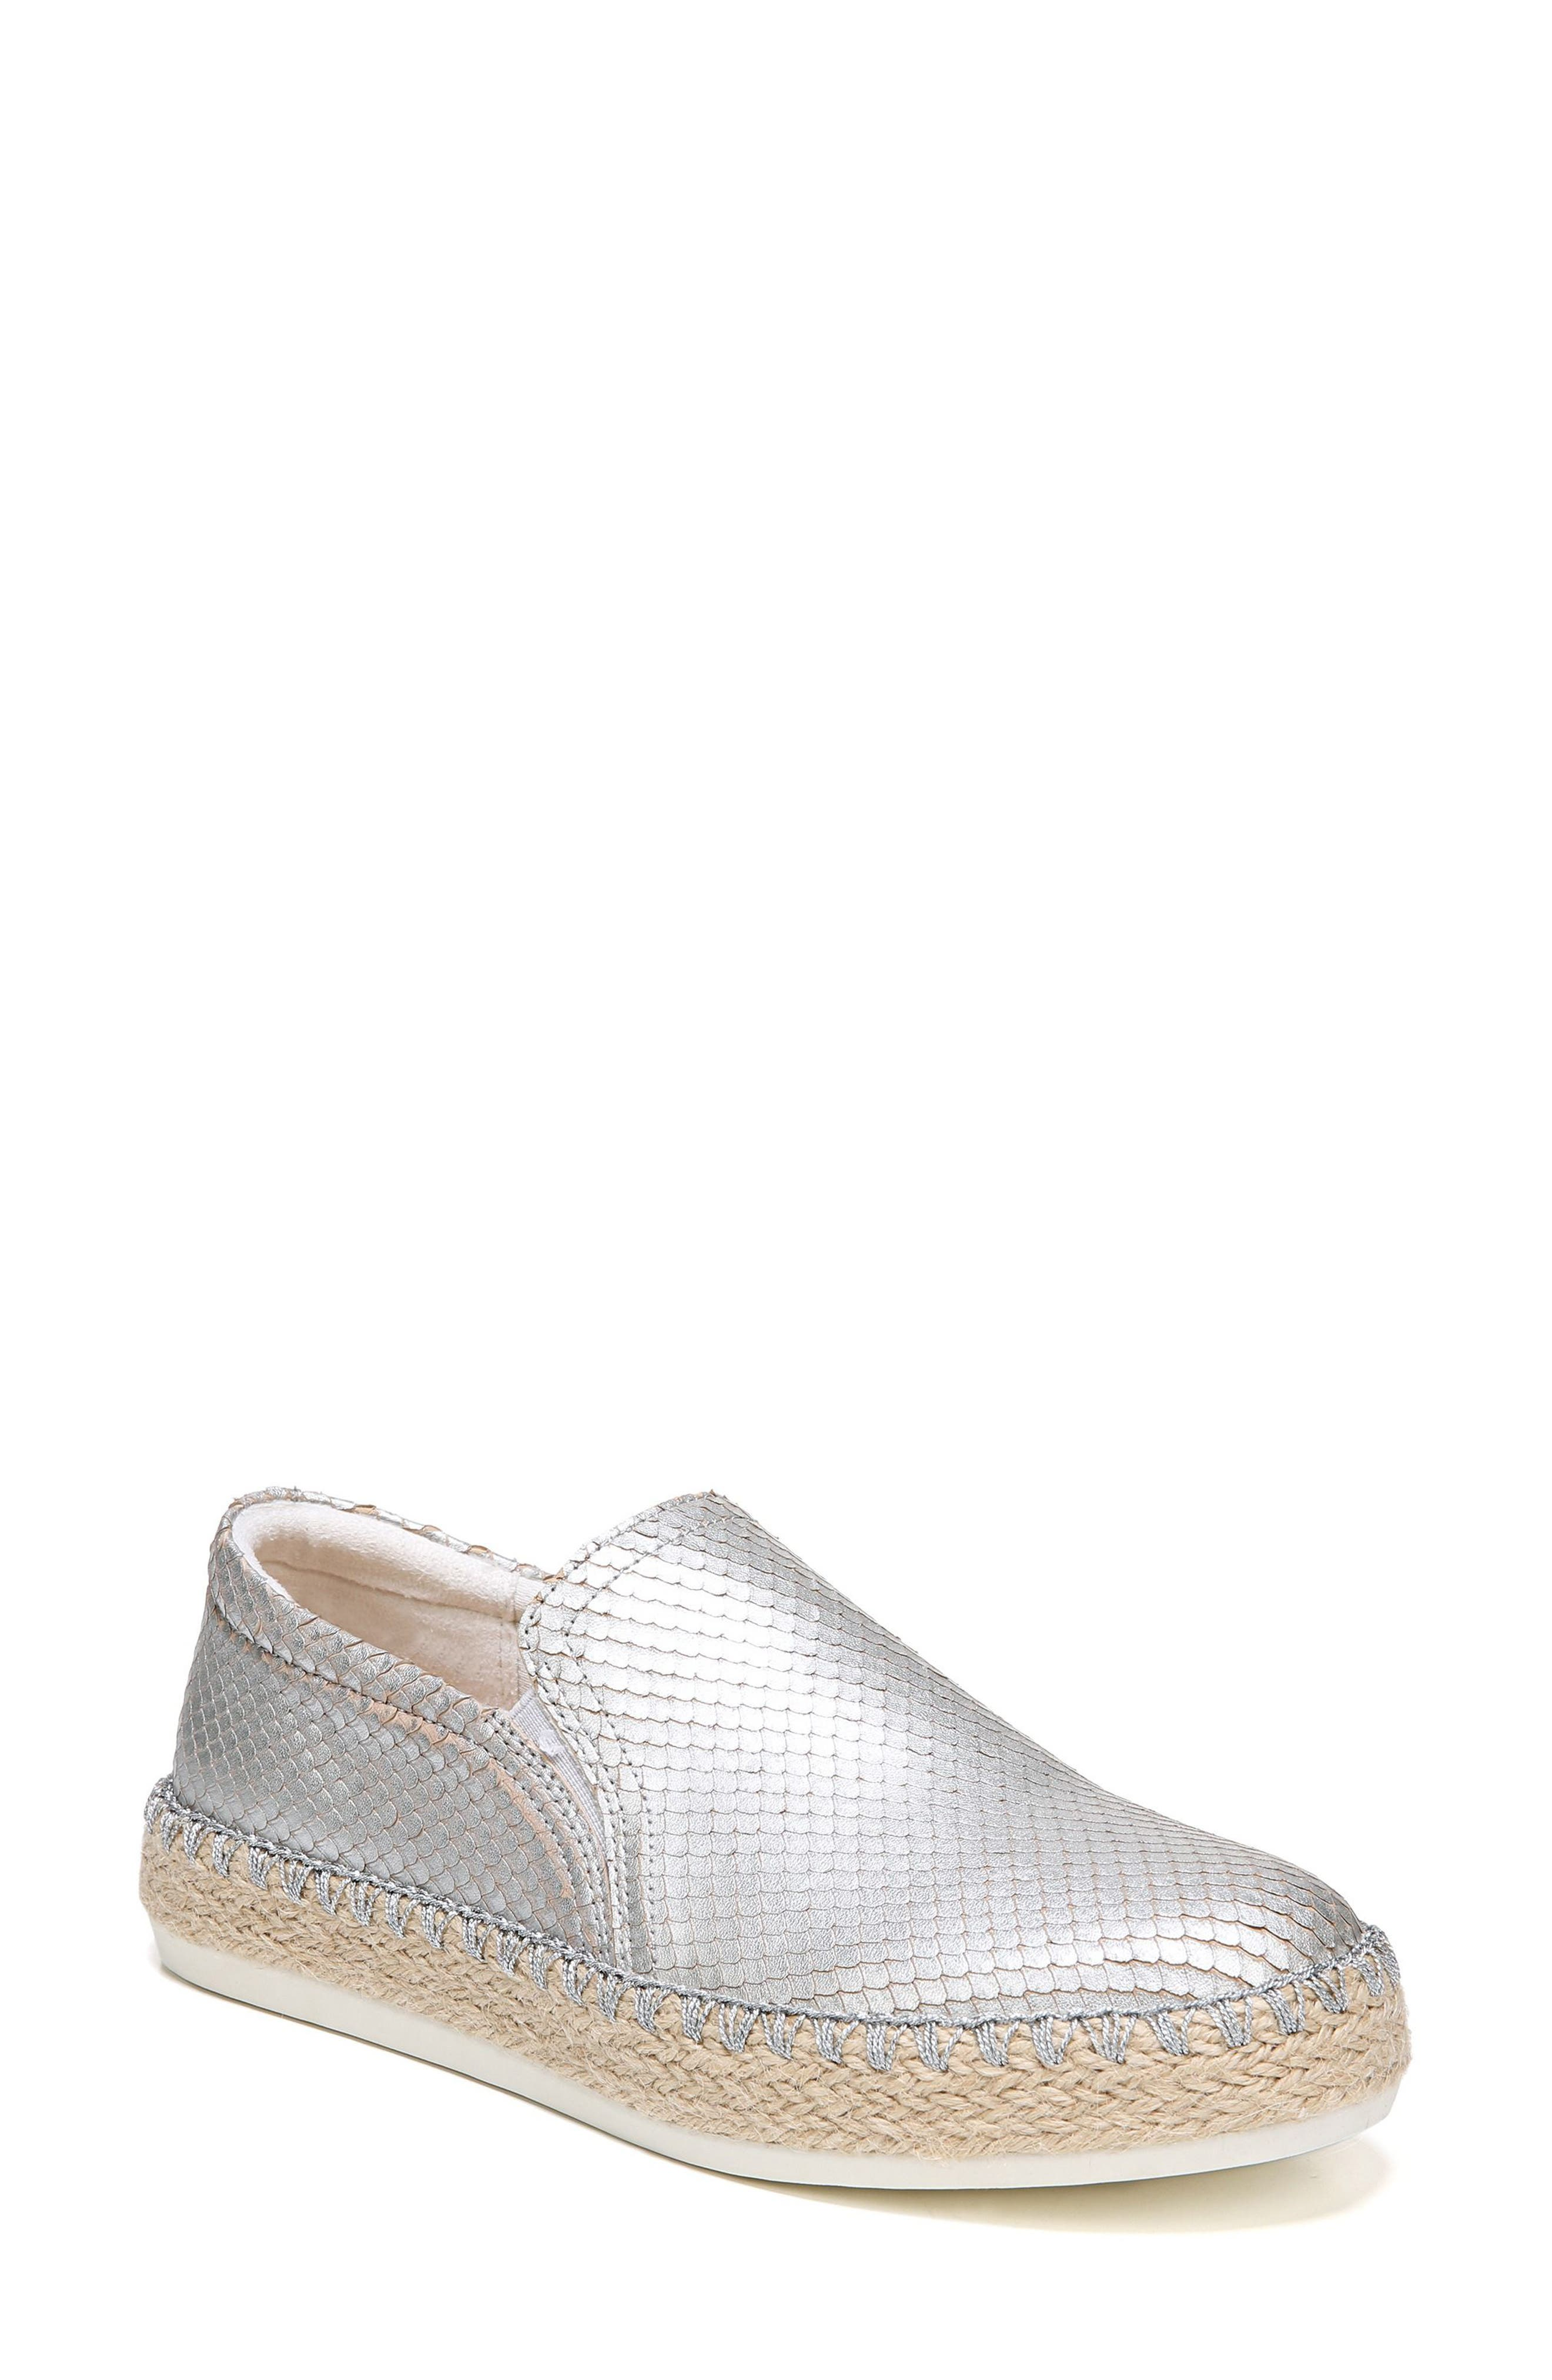 Dr. Scholl's Sunnie Slip-On Sneaker (Women)